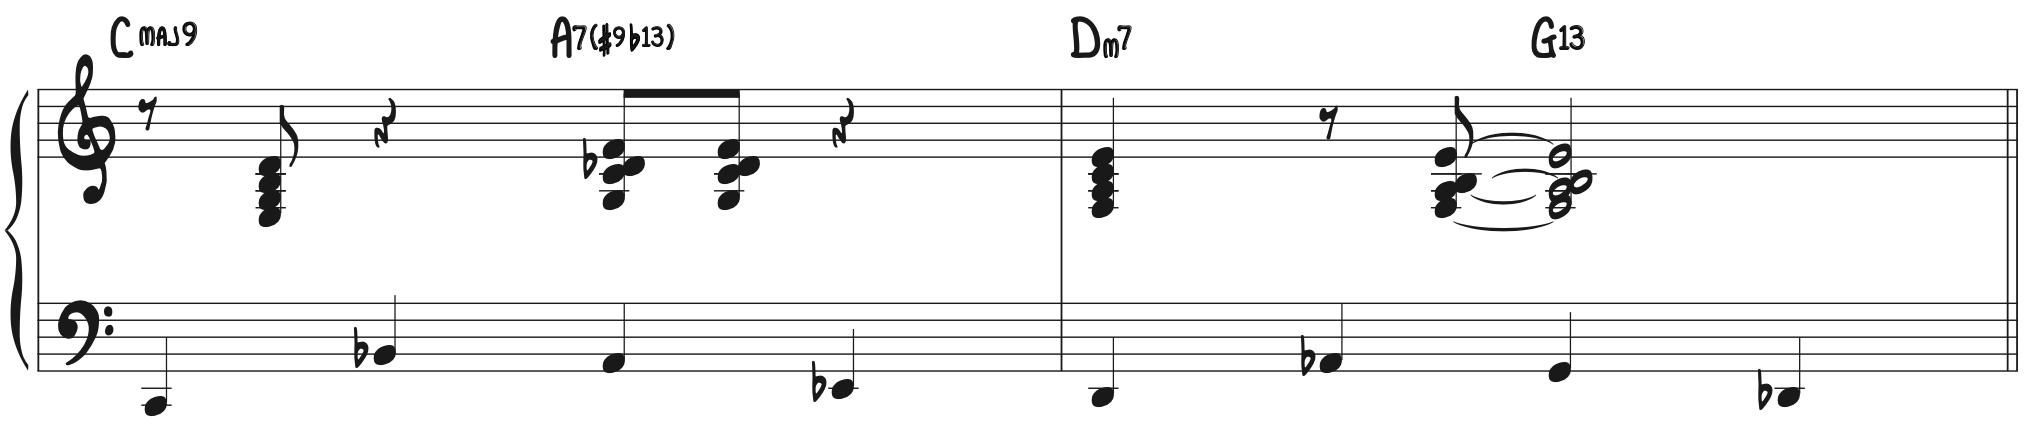 Blue Moon basic Walking Bass Line turnaround progression